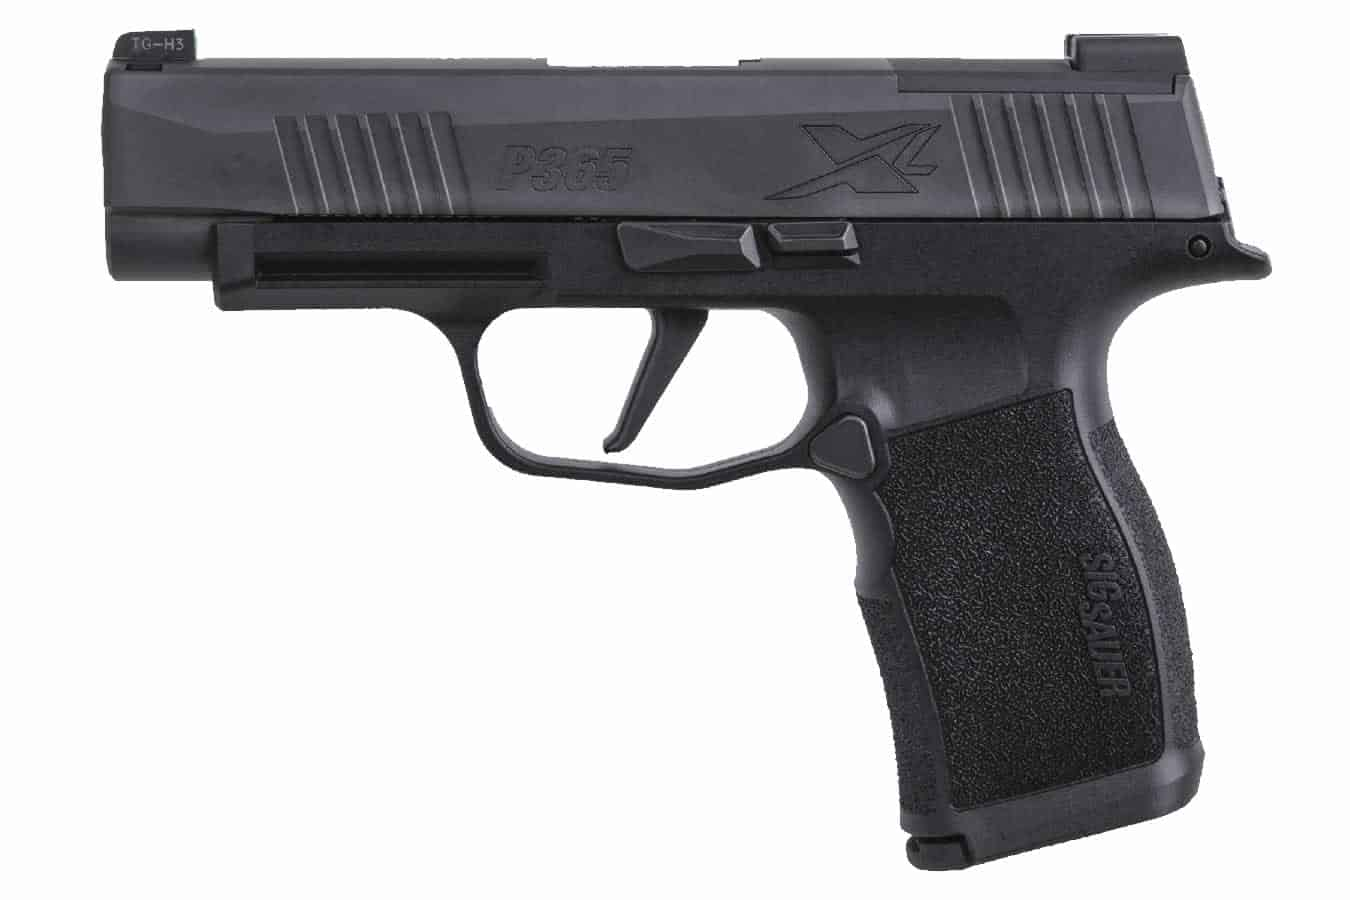 sig sauer p365 xl 9mm pistol at nagels